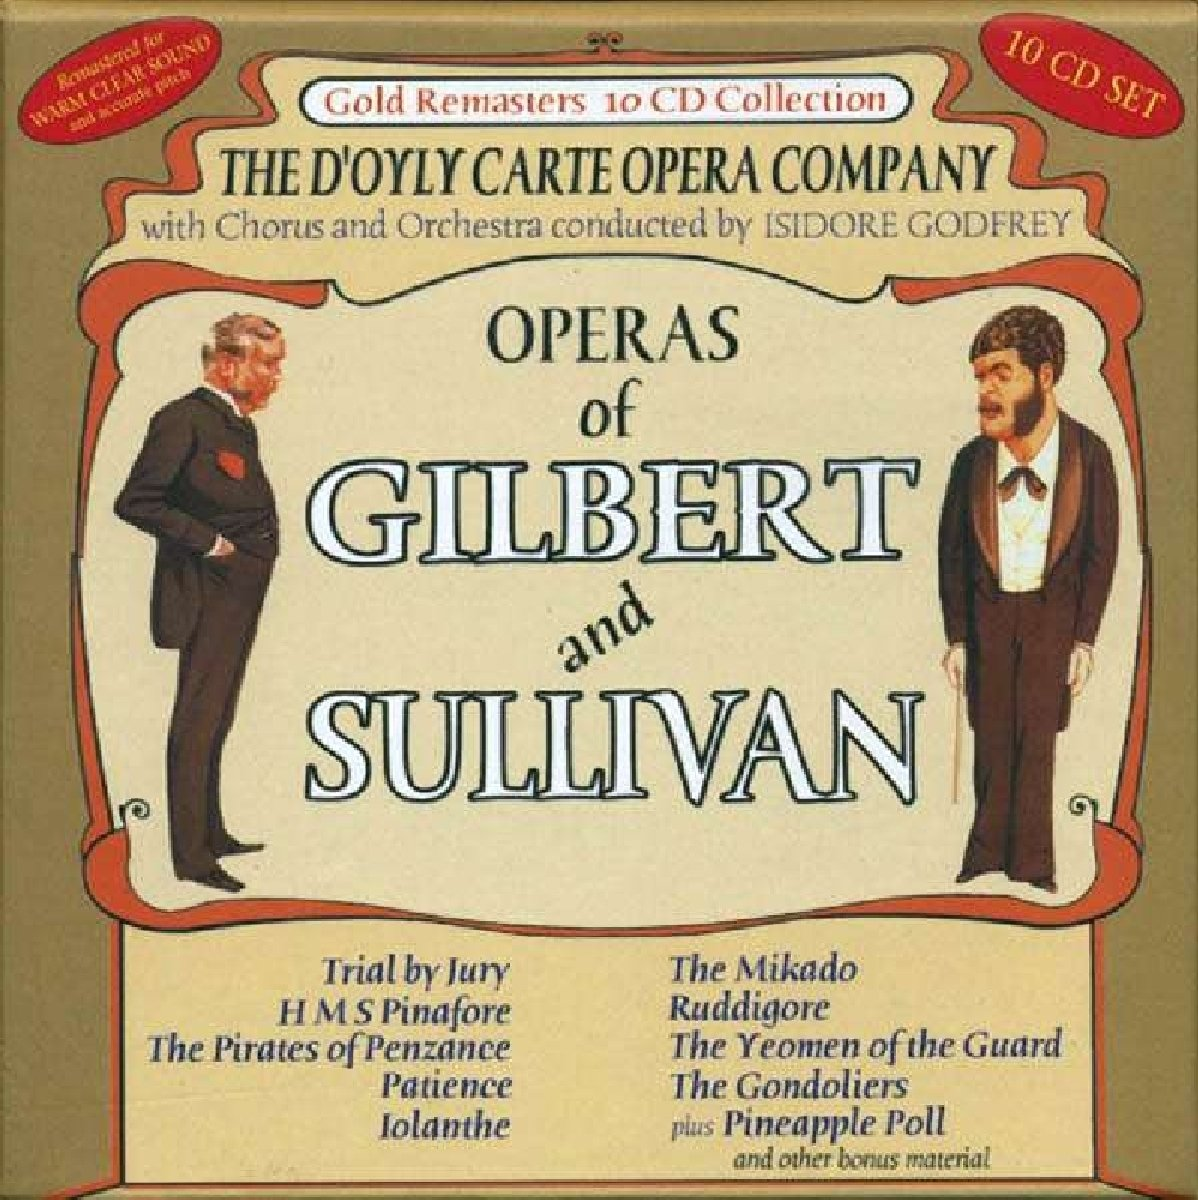 Operas of Gilbert & Sullivan by 3H